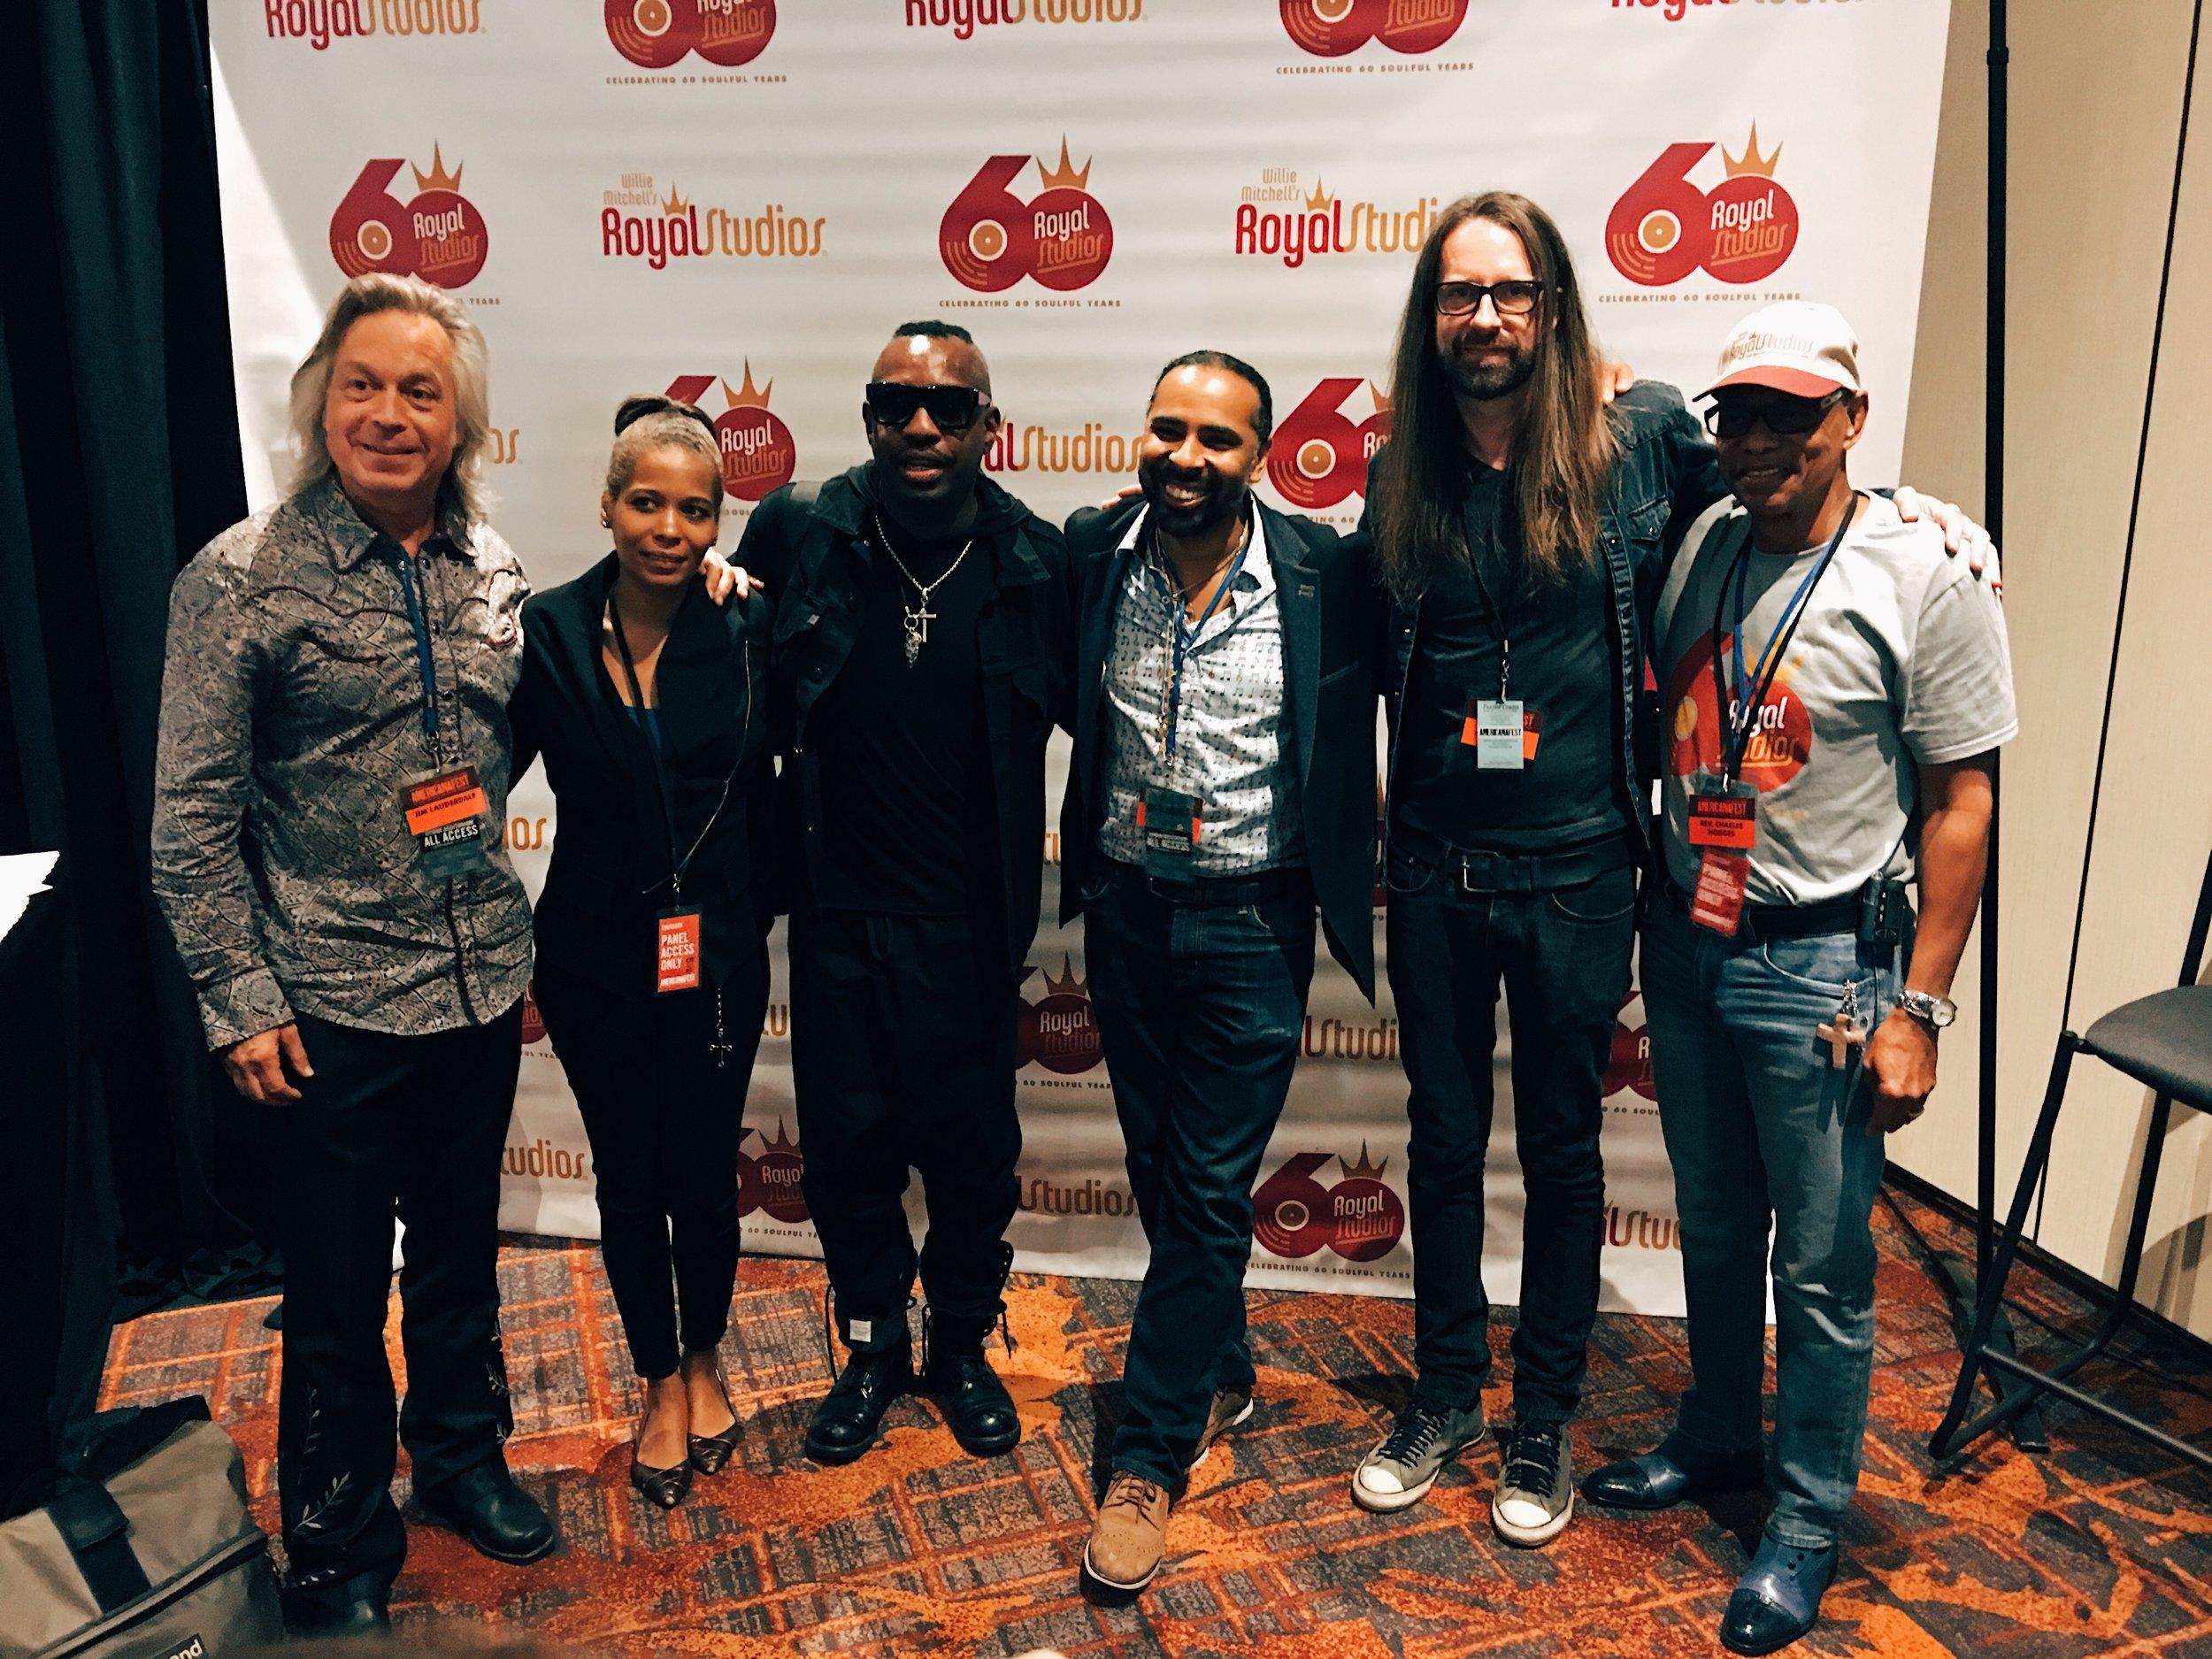 Jim Lauderdale, Oona Mitchell, Steve Jordan, Boo Mitchell, Chris Bell, and Charles Hodges (Hi Rhythm Section) Nashville, TN